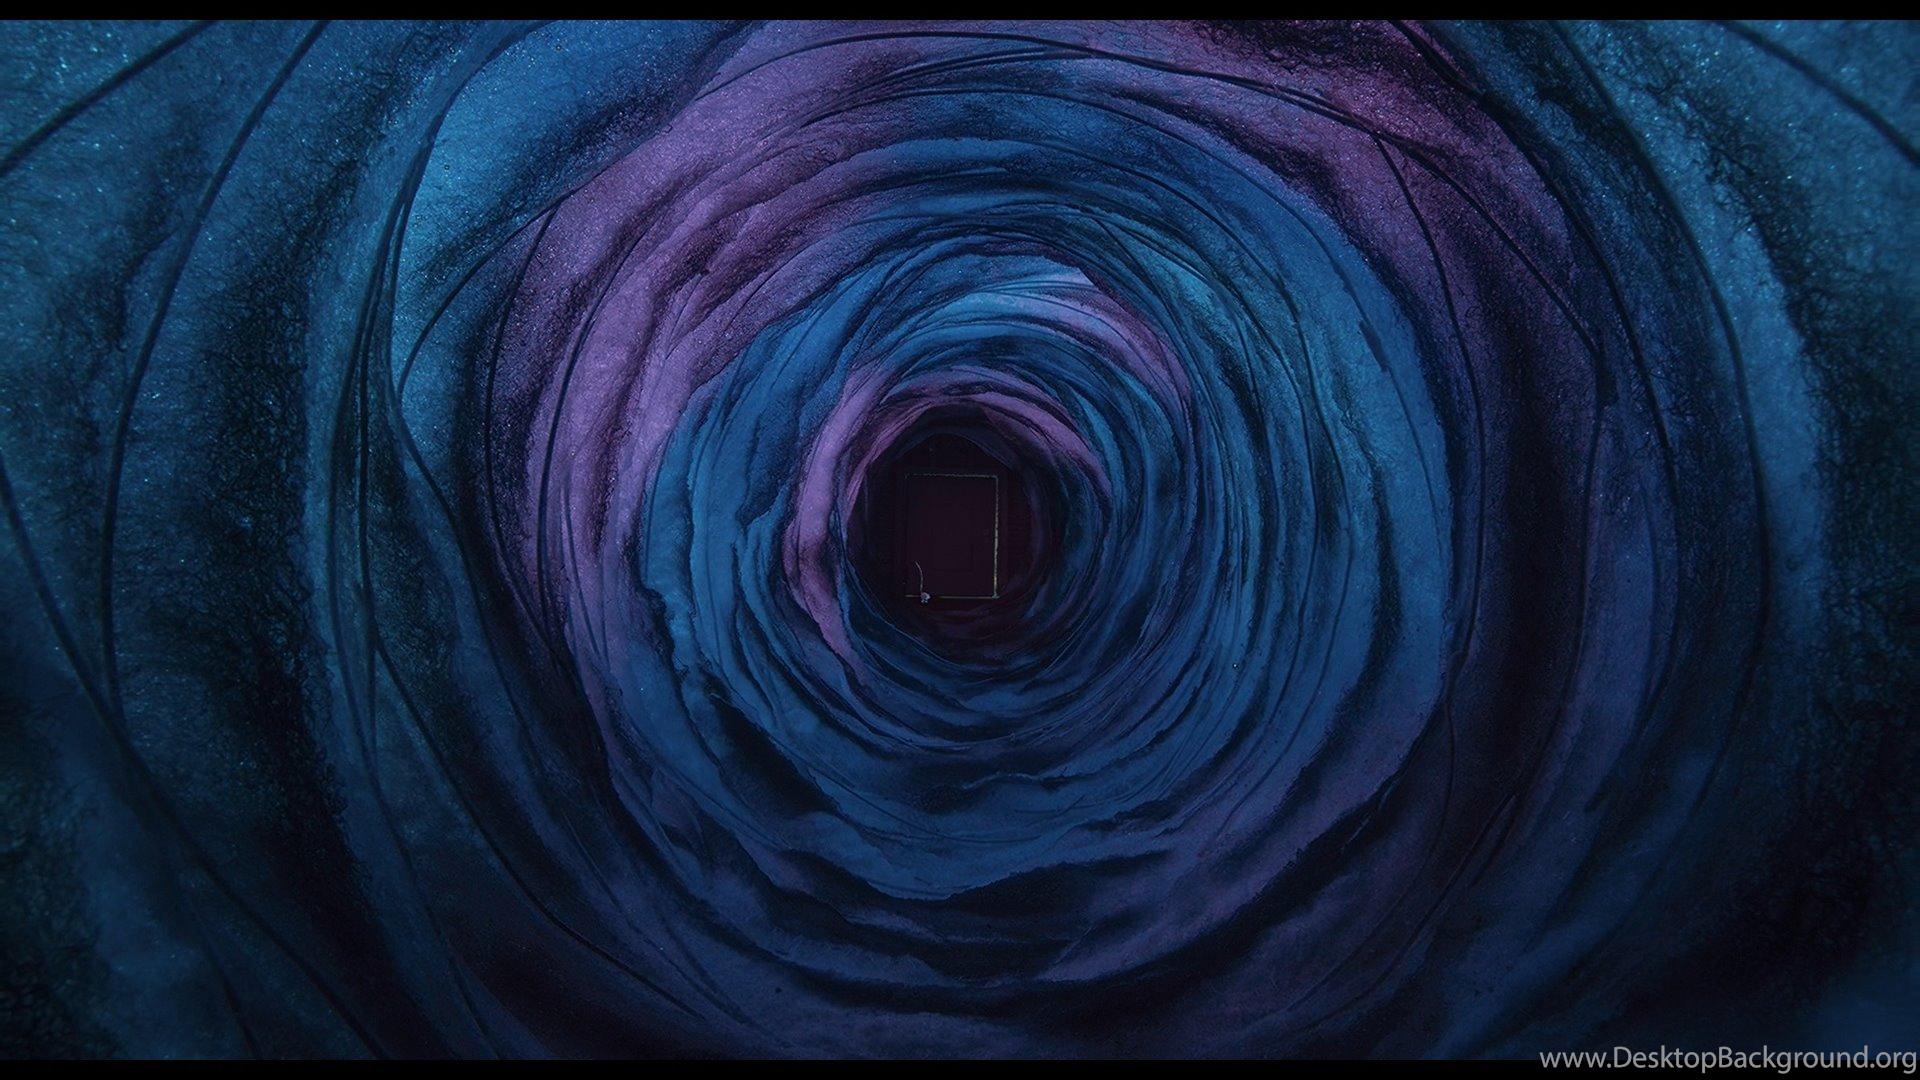 Blue View Hd Coraline Wallpaper Png Desktop Background